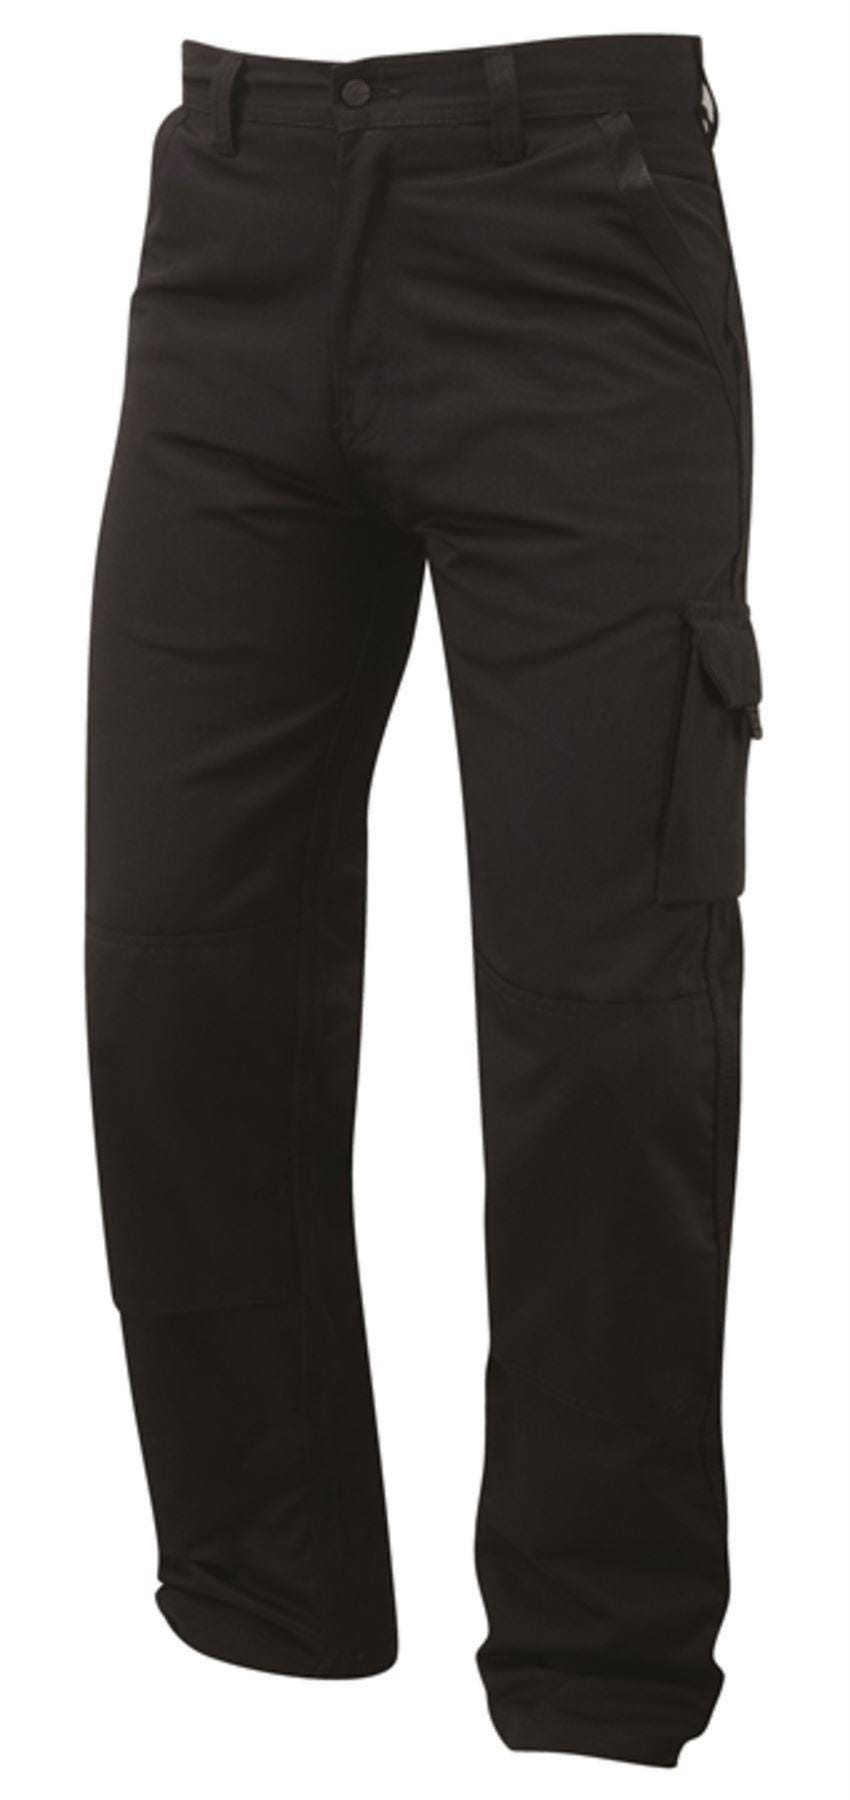 Orn Heron Kneepad Combat Trousers - Black|52W32L